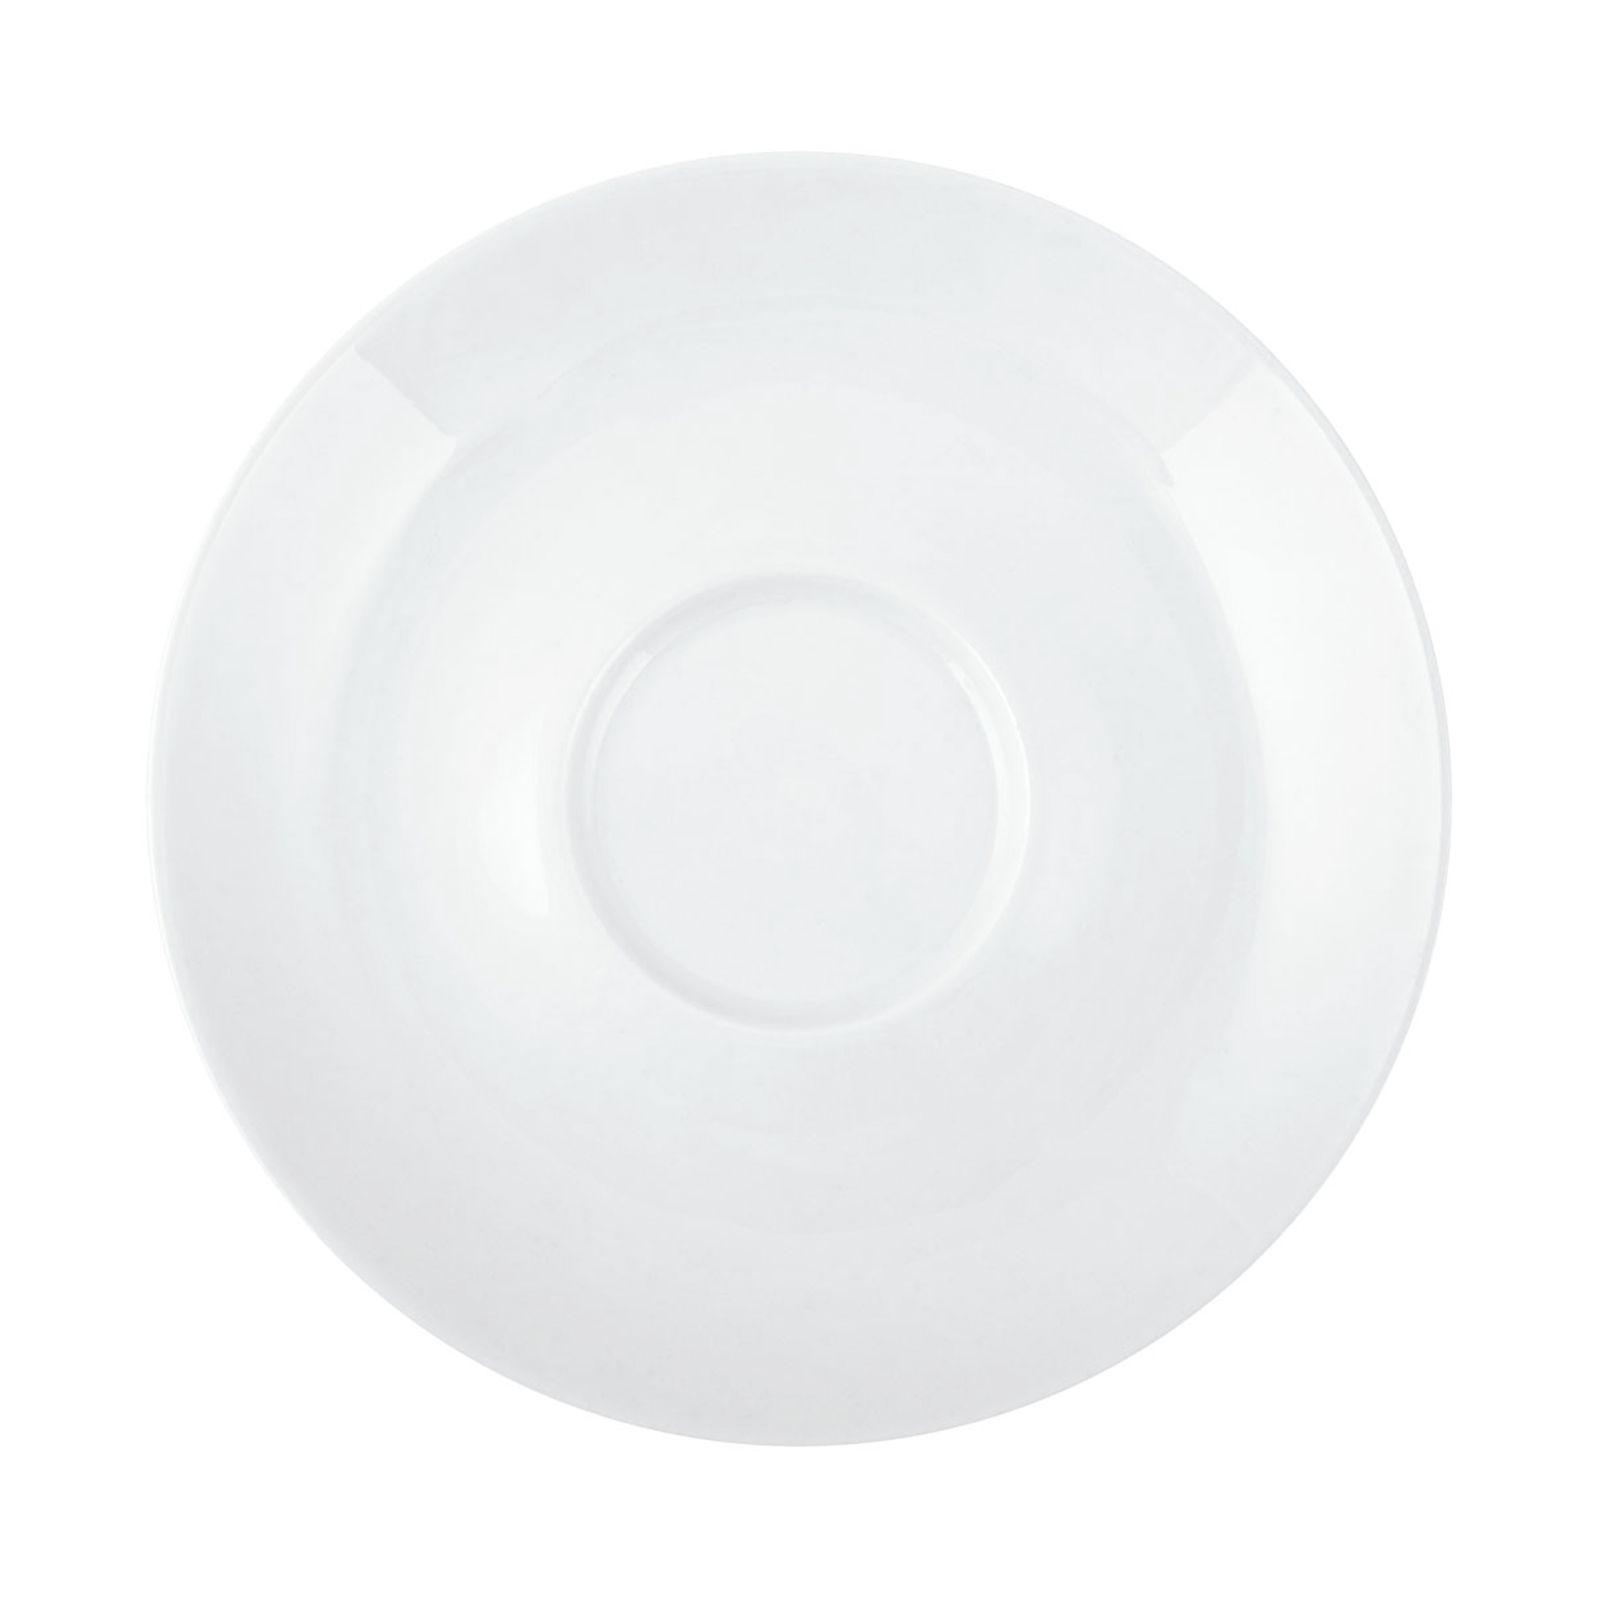 Saucer Salsa 14 cm AMBITION